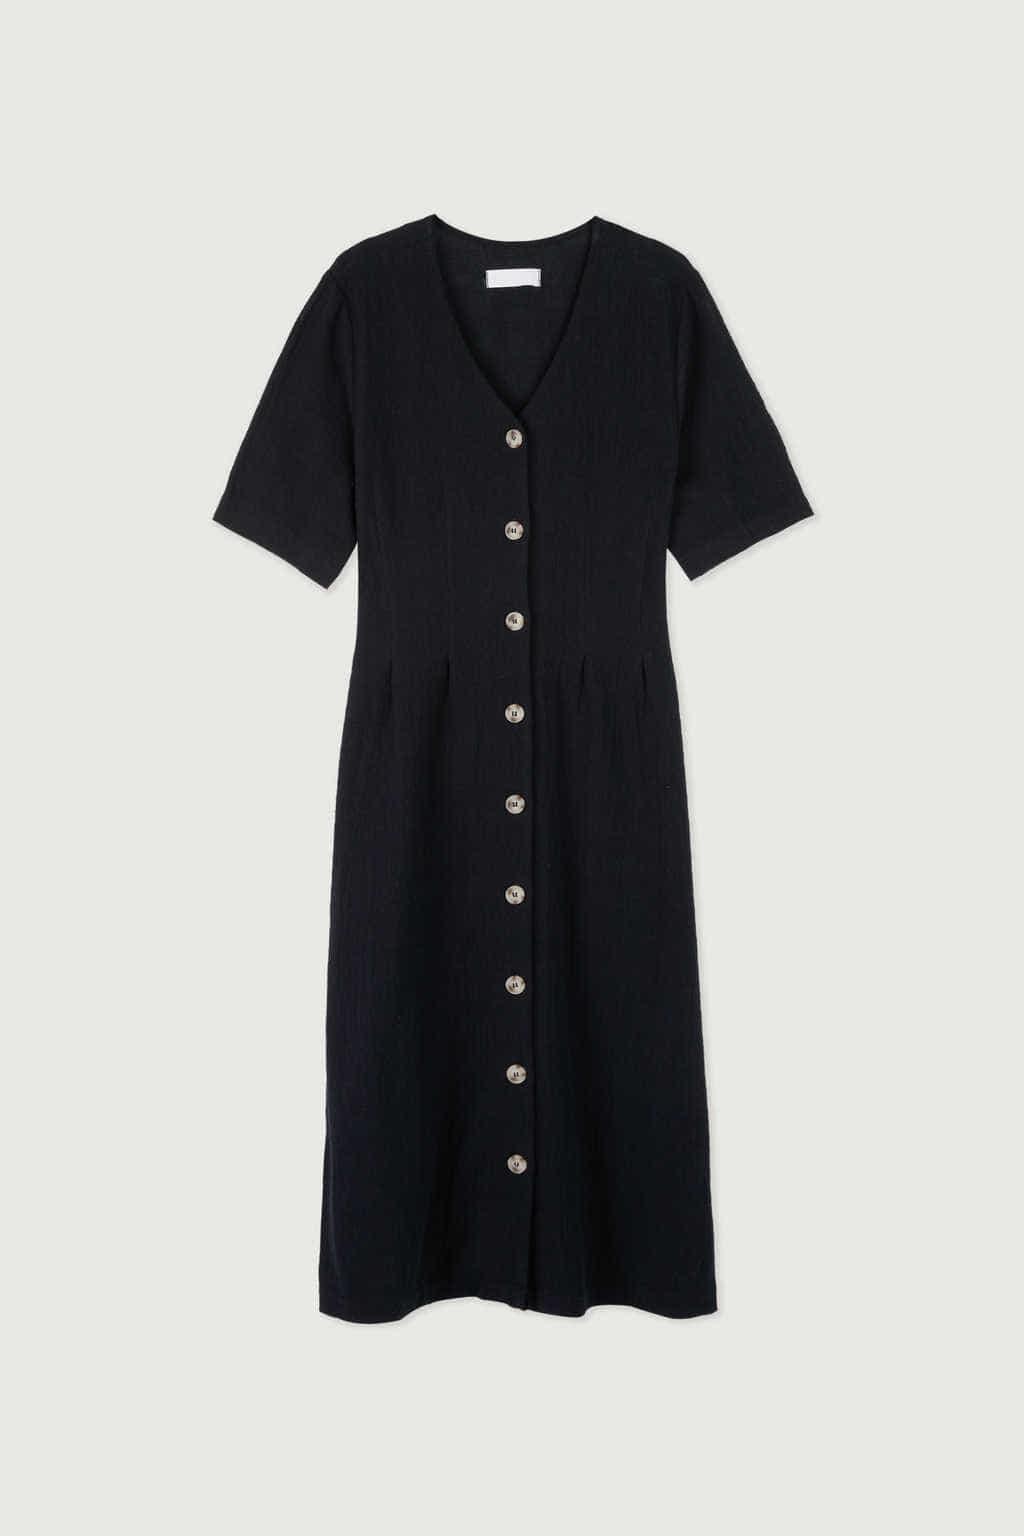 Dress 3159 Black 12